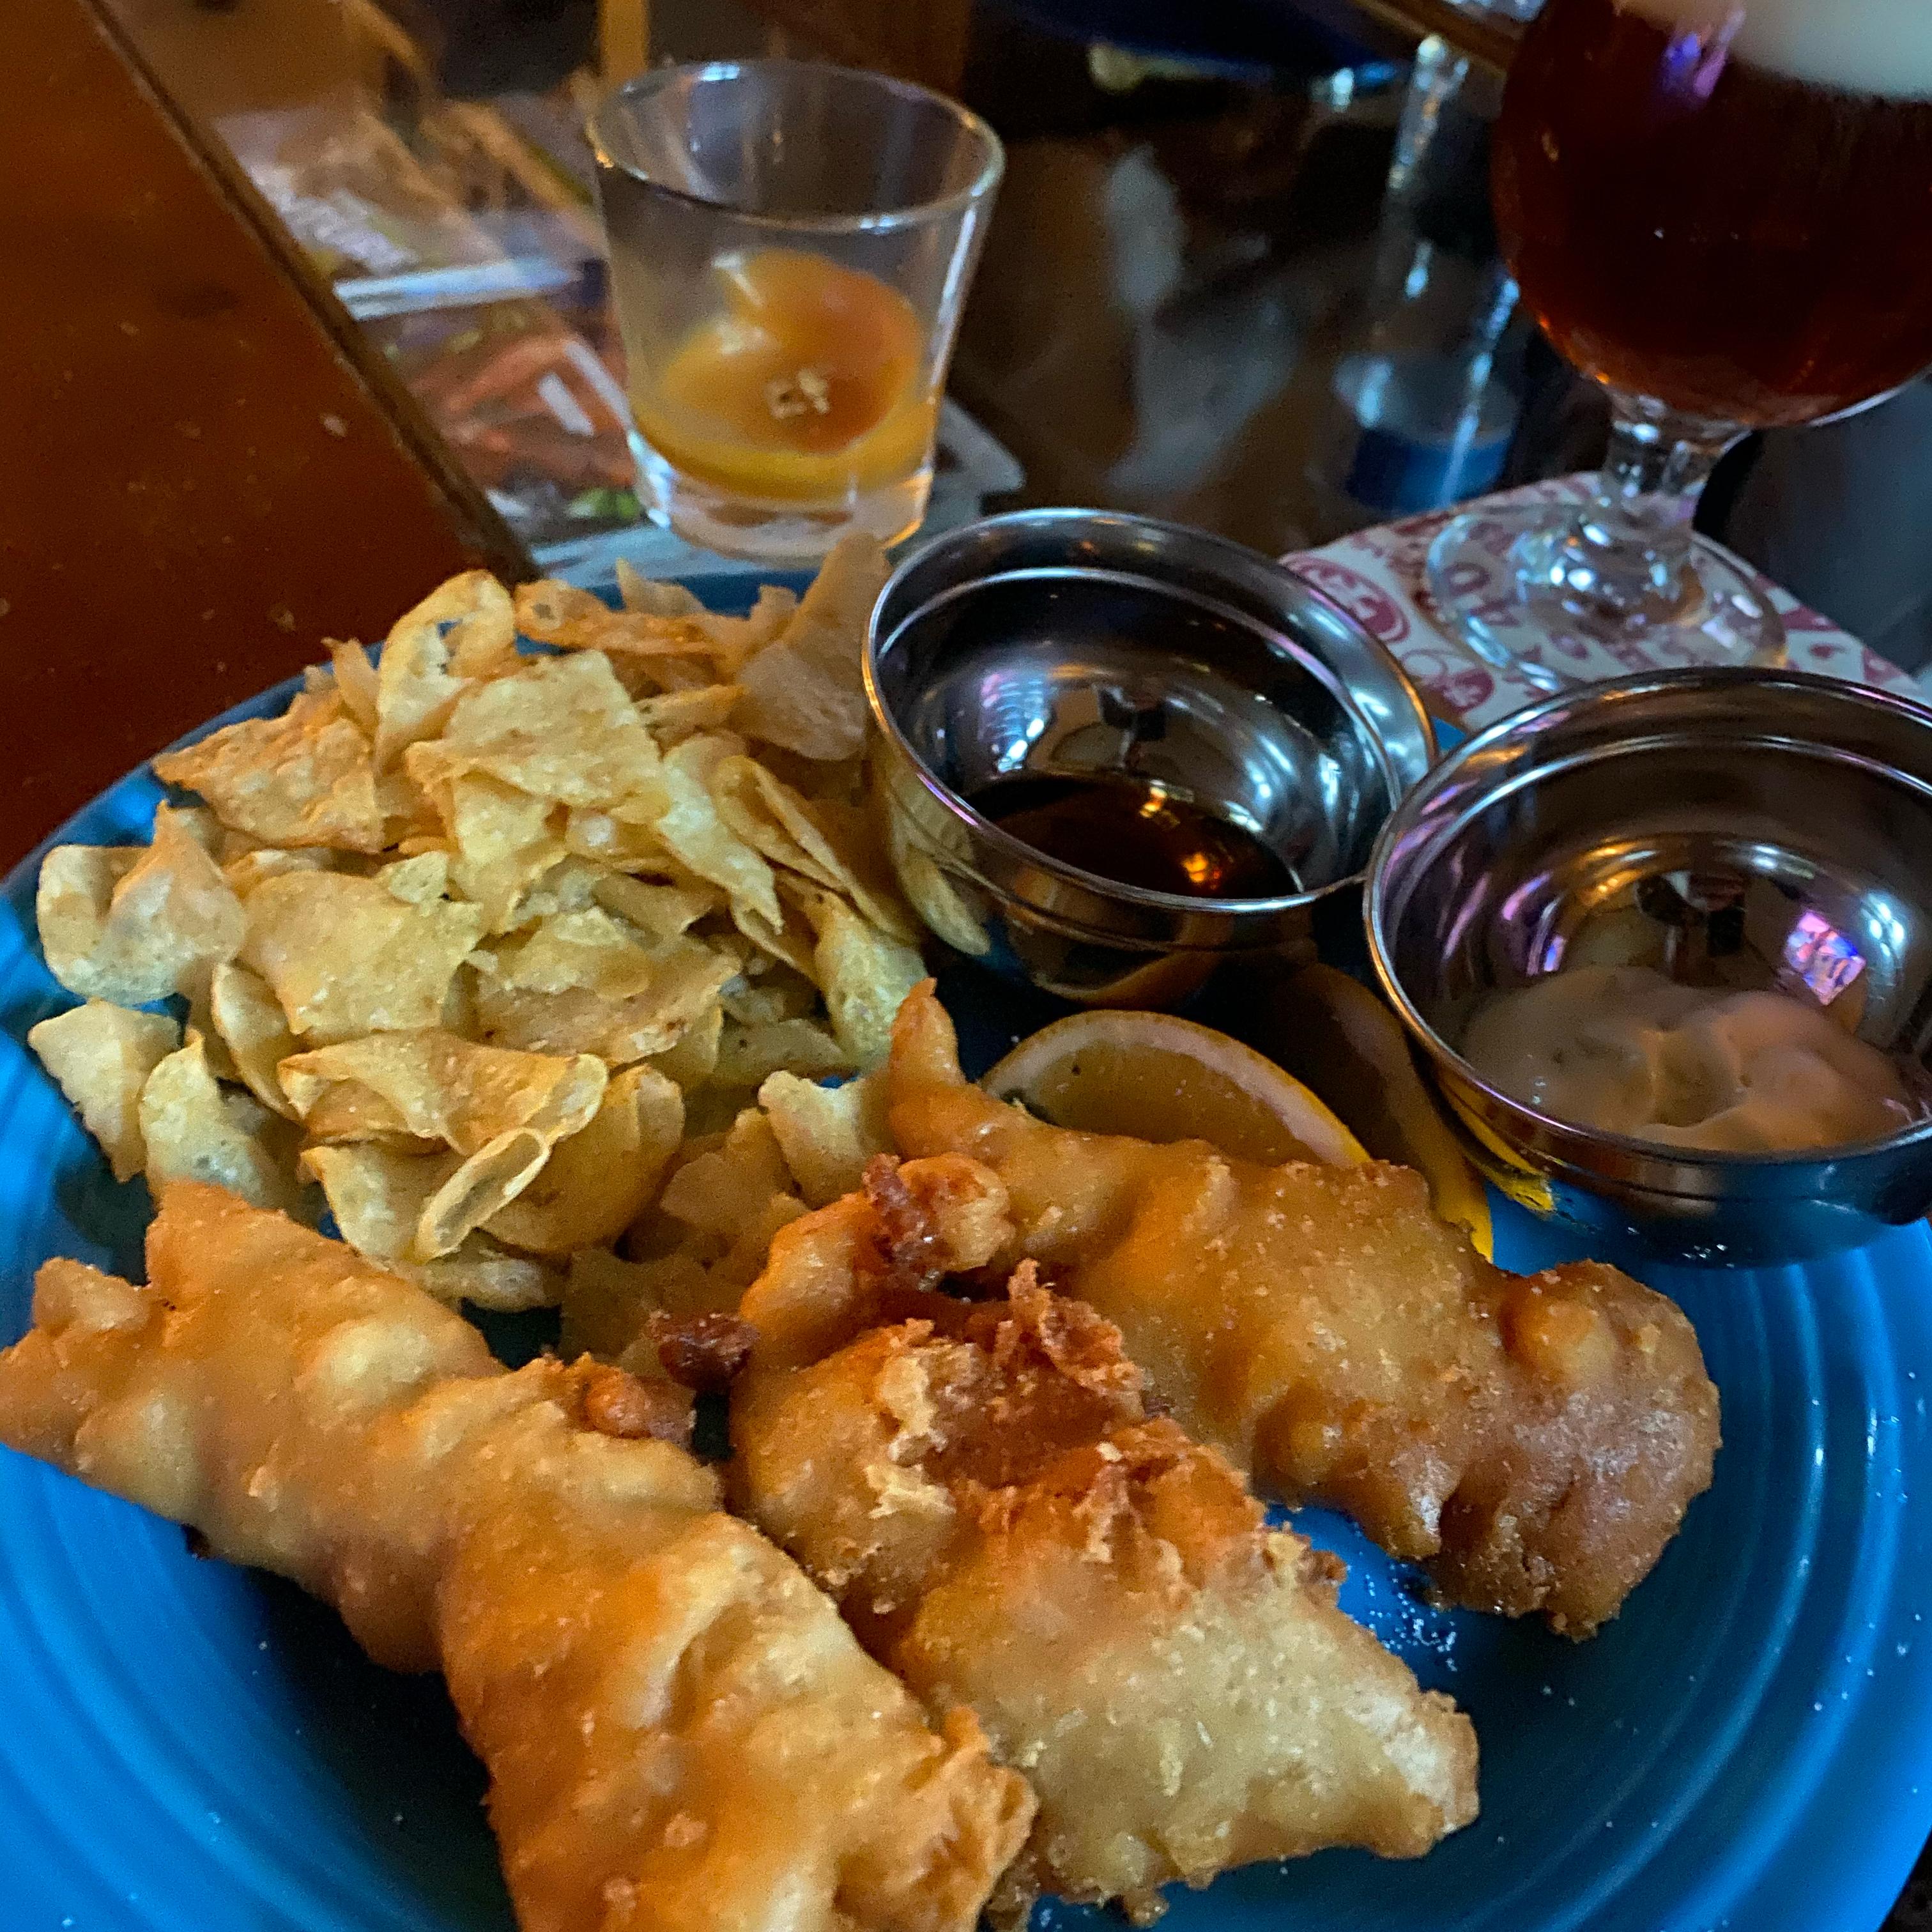 Crispy Beer Batter Fish & Chips Gregg Dorr